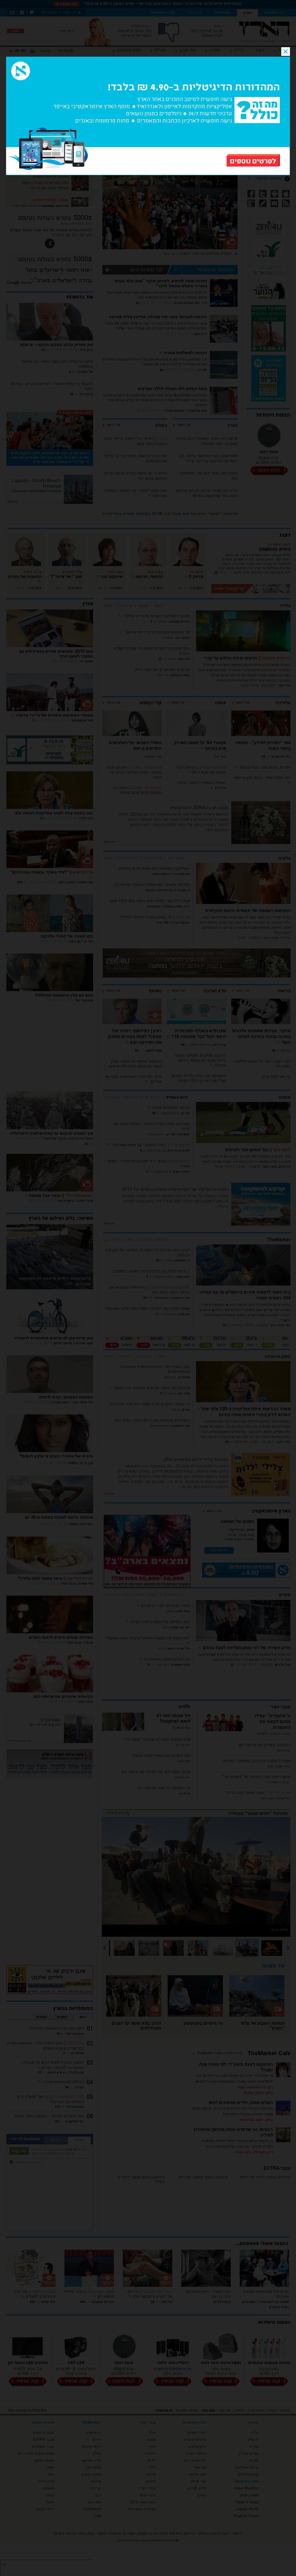 Haaretz at Sunday Sept. 1, 2013, 9:08 p.m. UTC